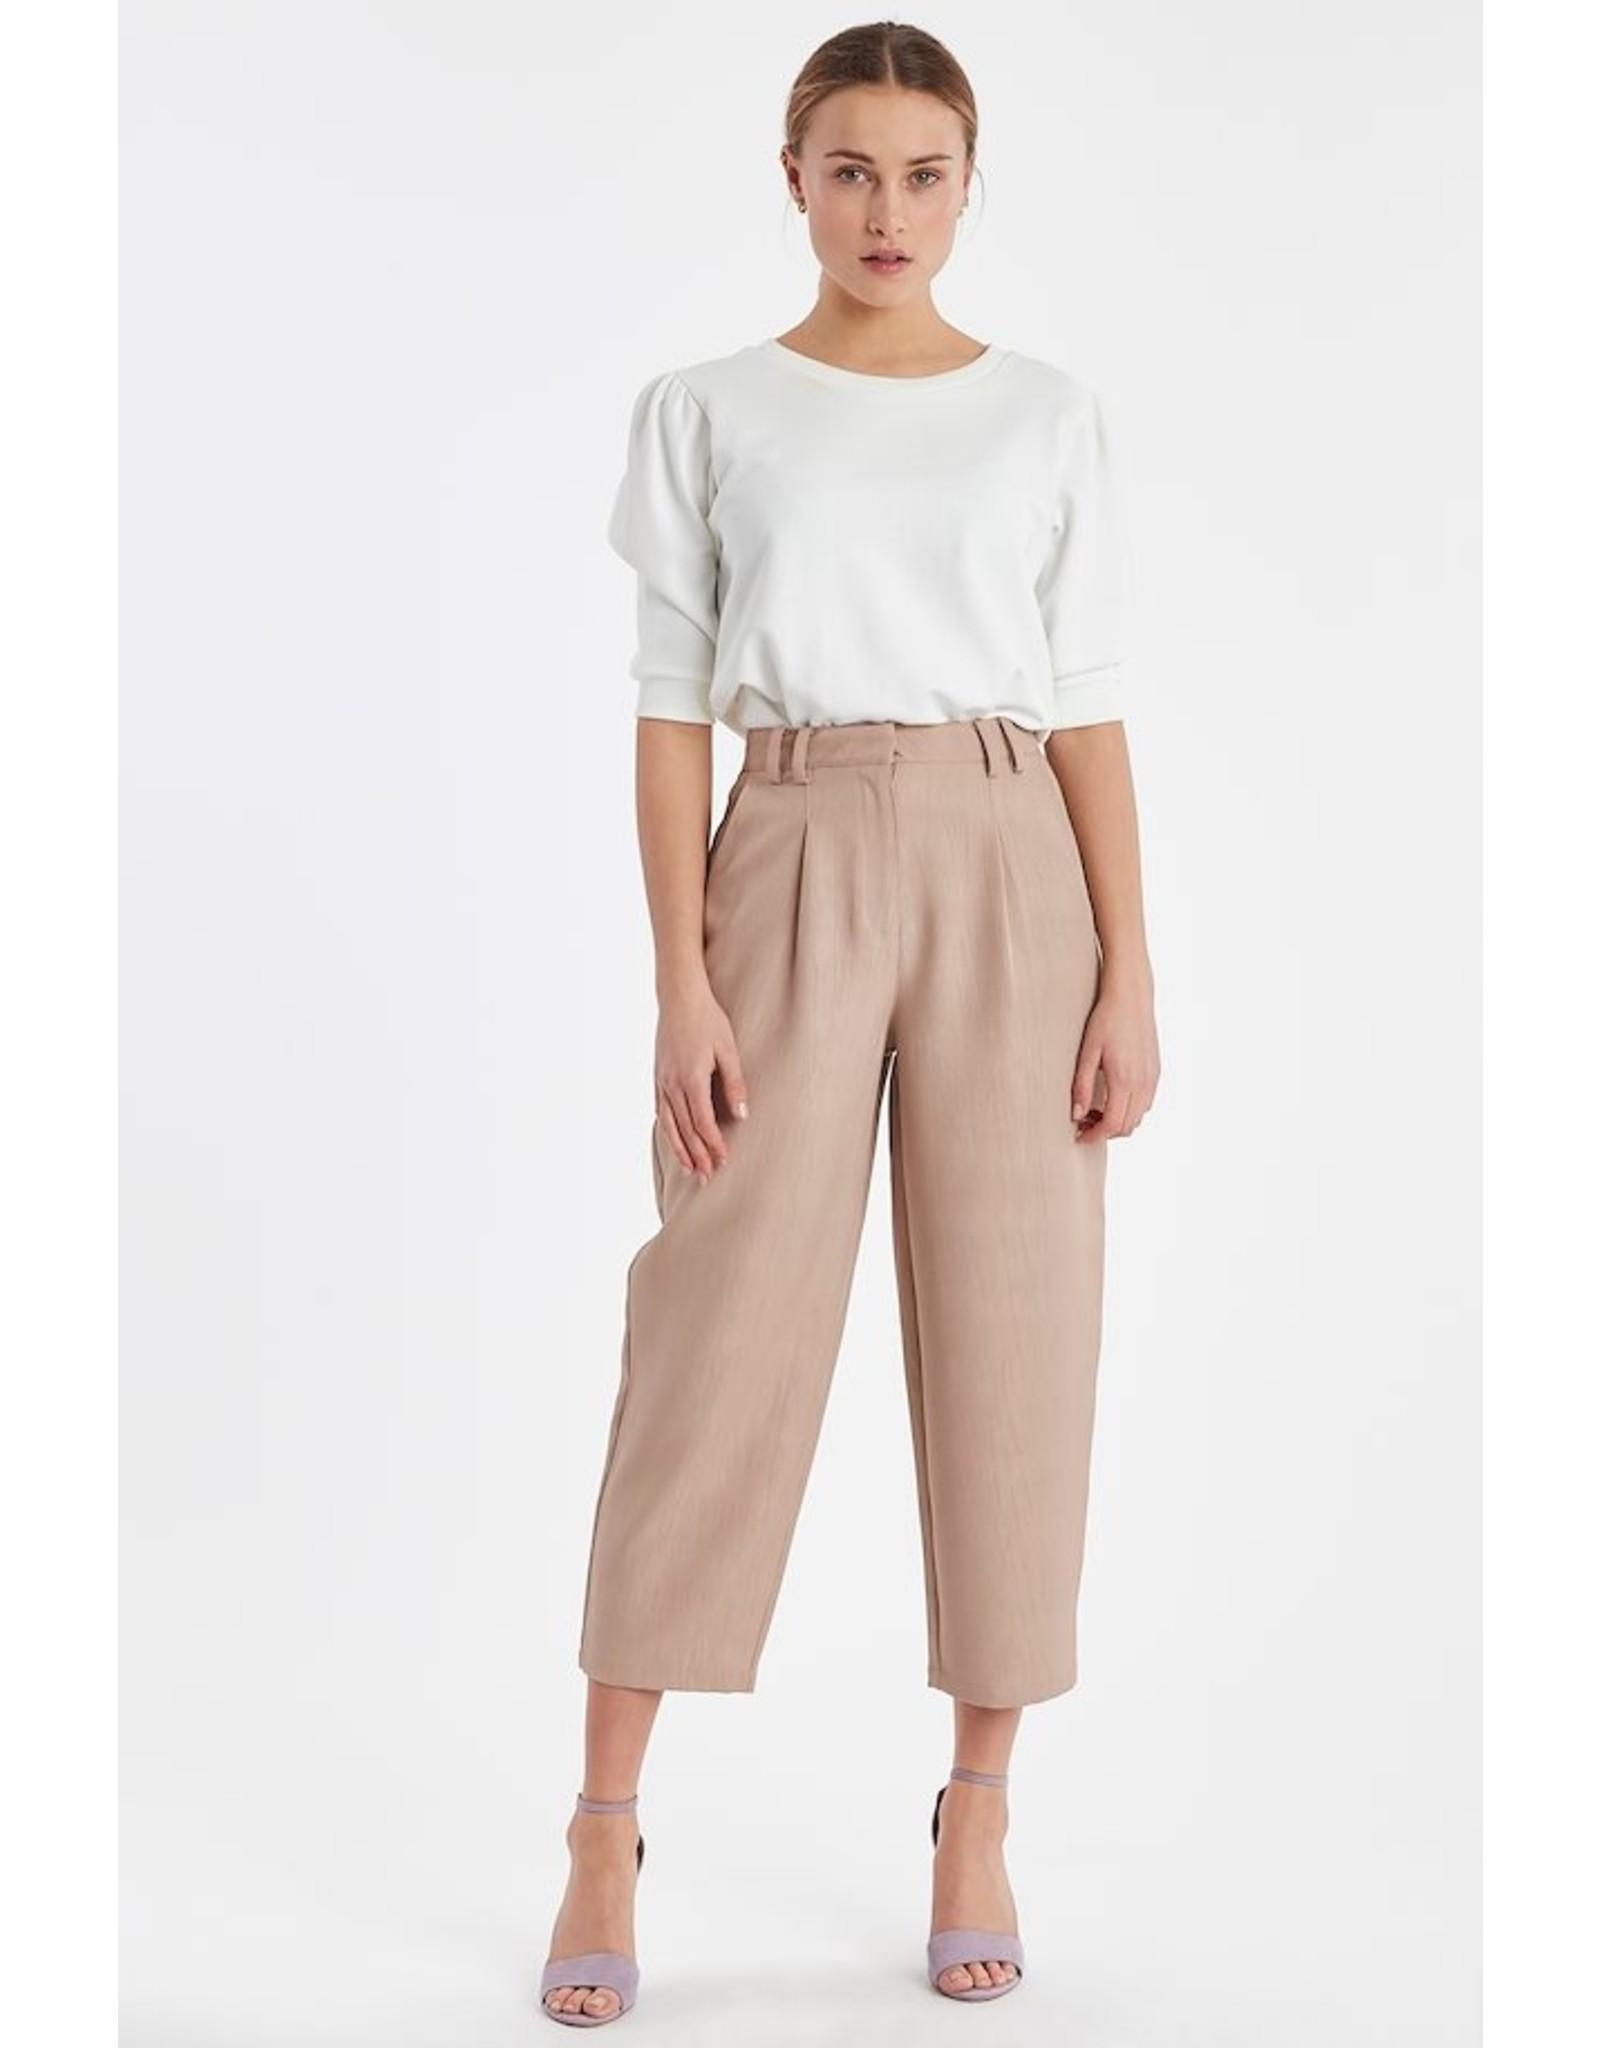 ICHI Fantine Trousers